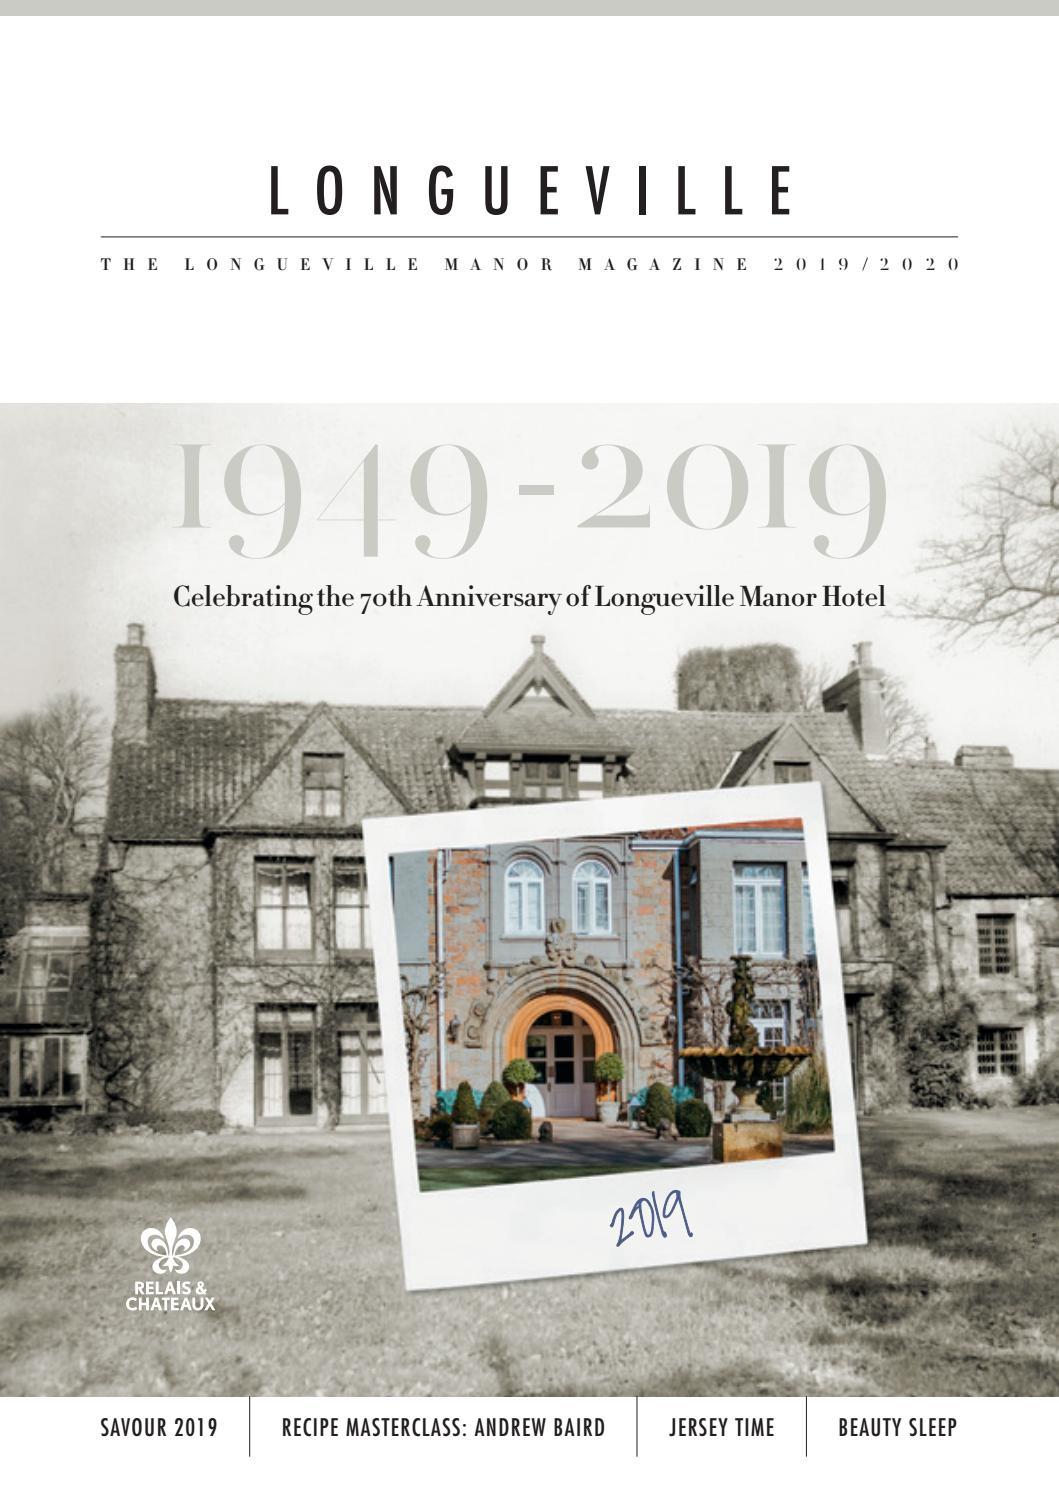 Longueville Manor Magazine 2019/2020 by Switch Digital - issuu